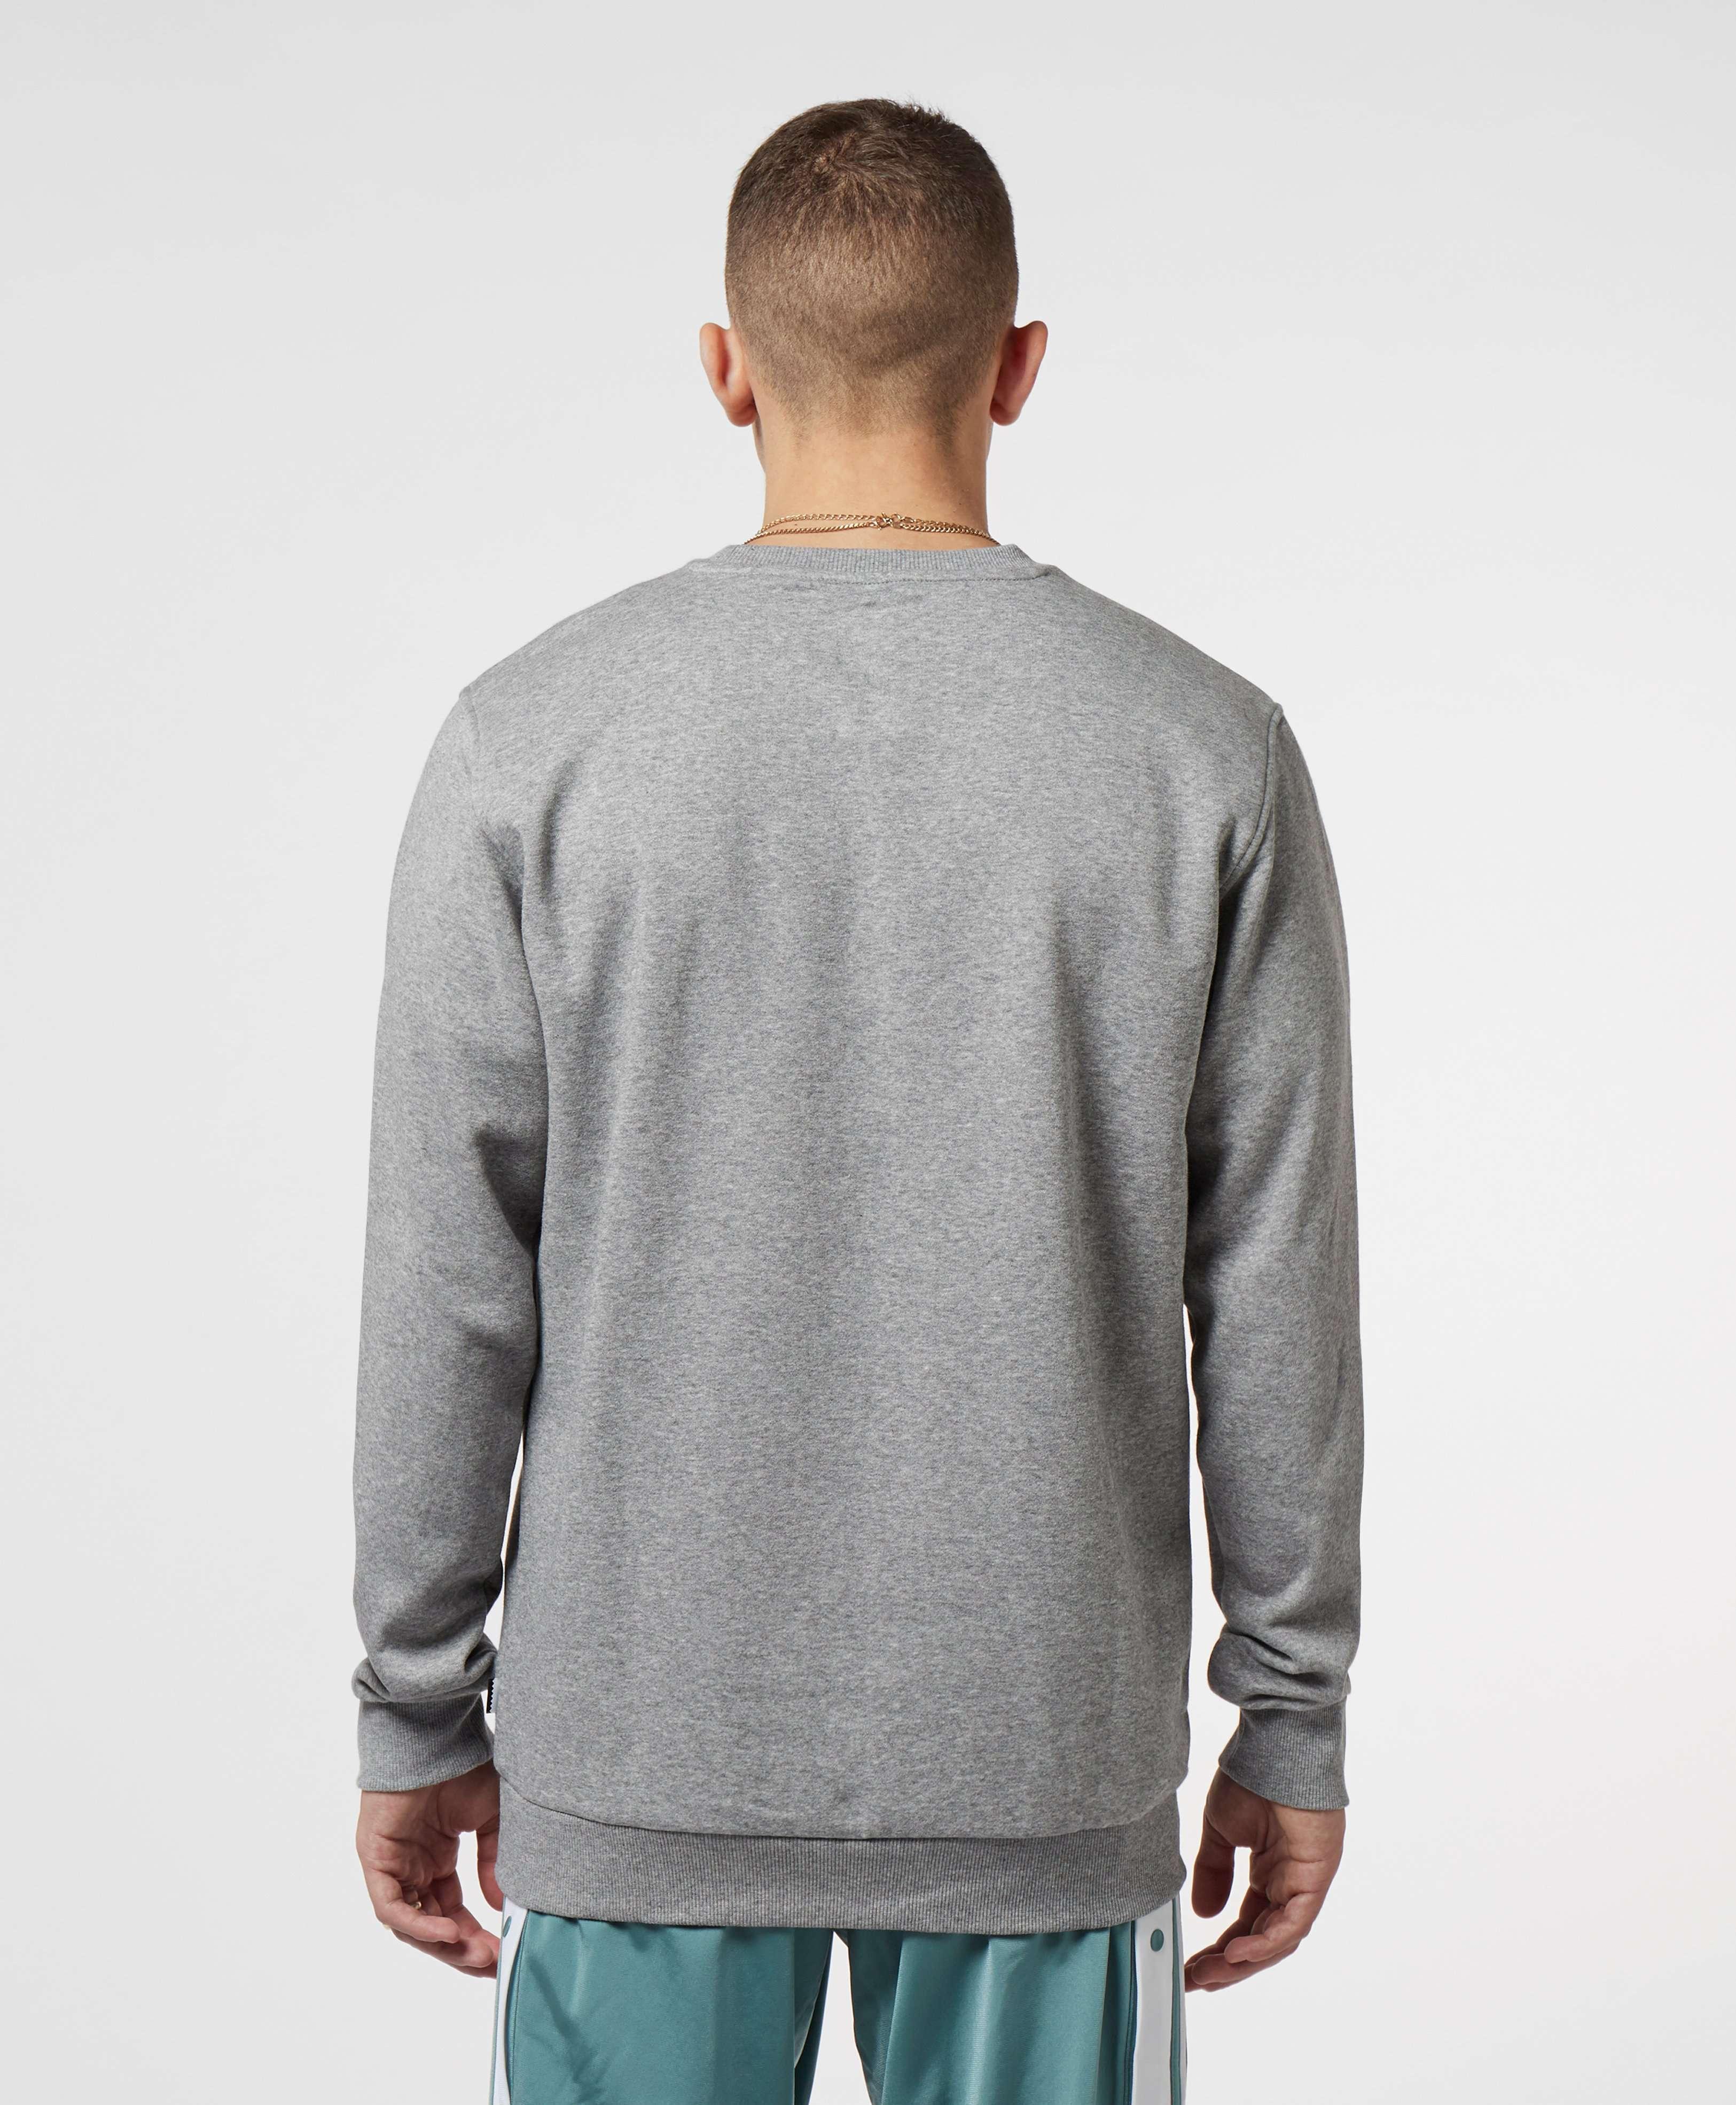 adidas Originals Logo Sweatshirt - Online Exclusive